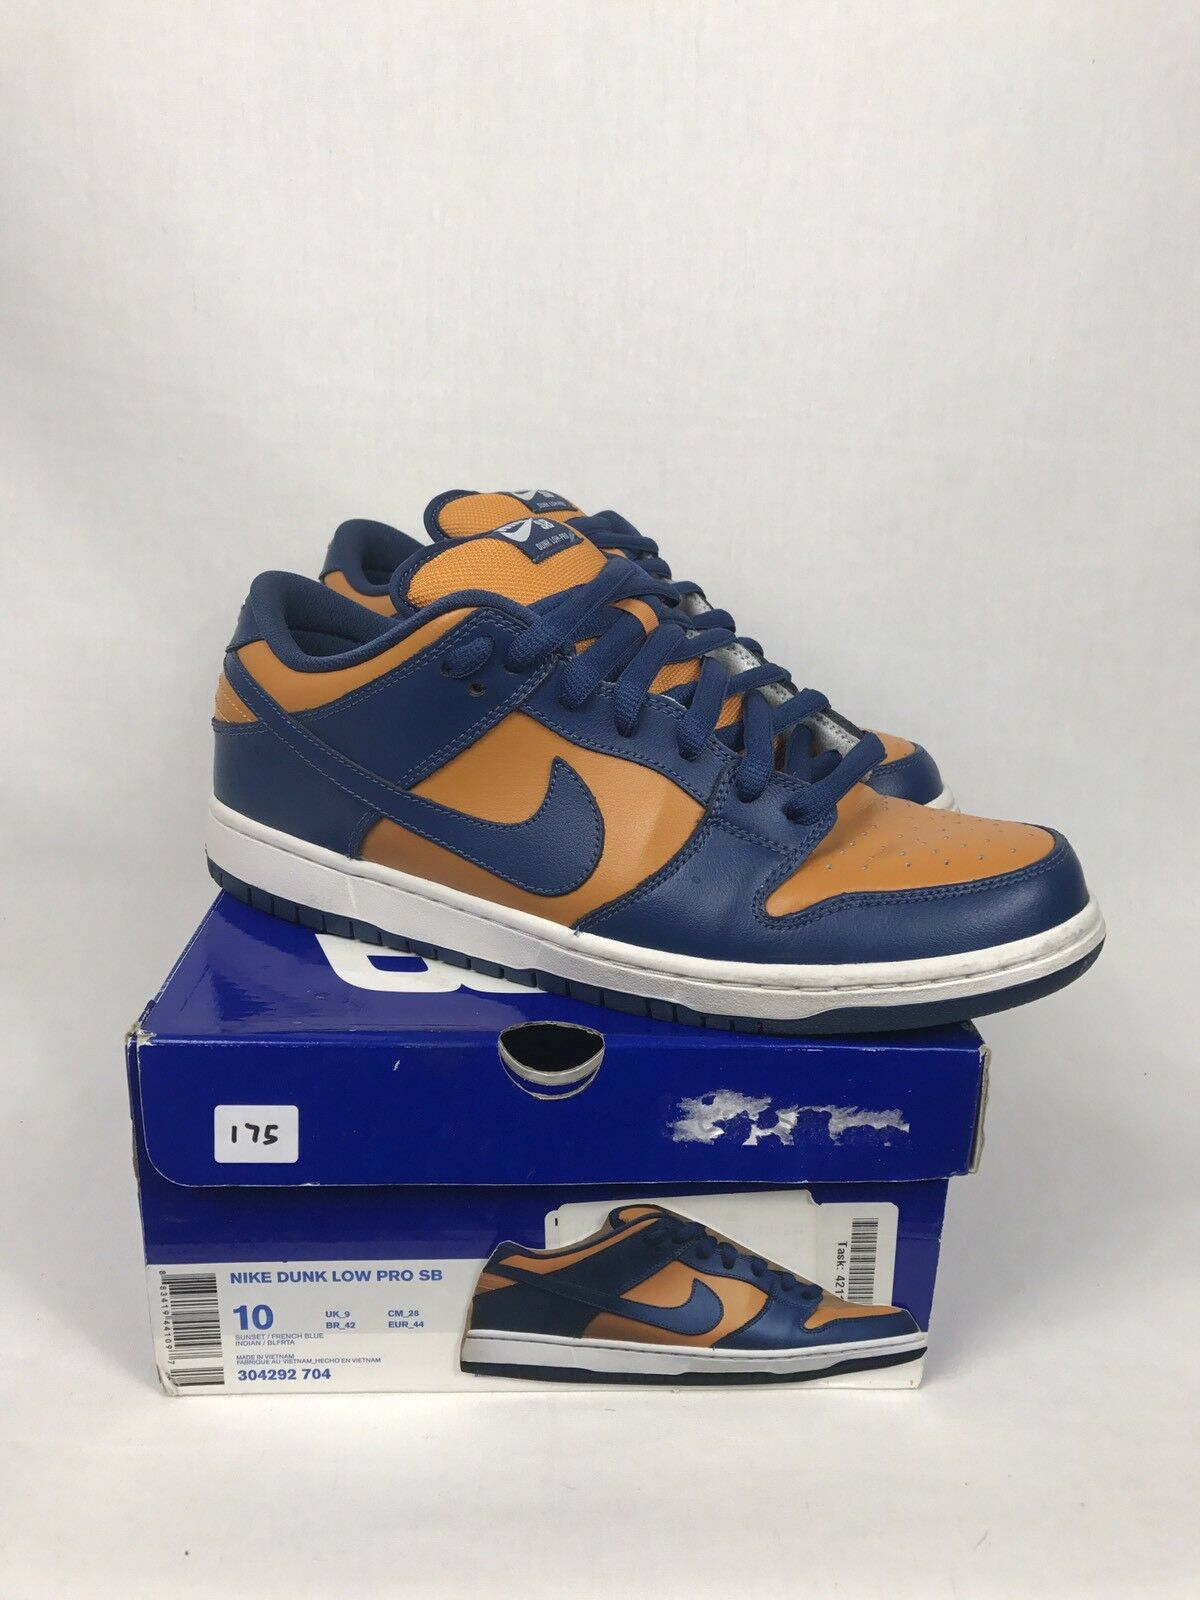 2011 Nike Dunk Low Pro SB Comfortable Brand discount